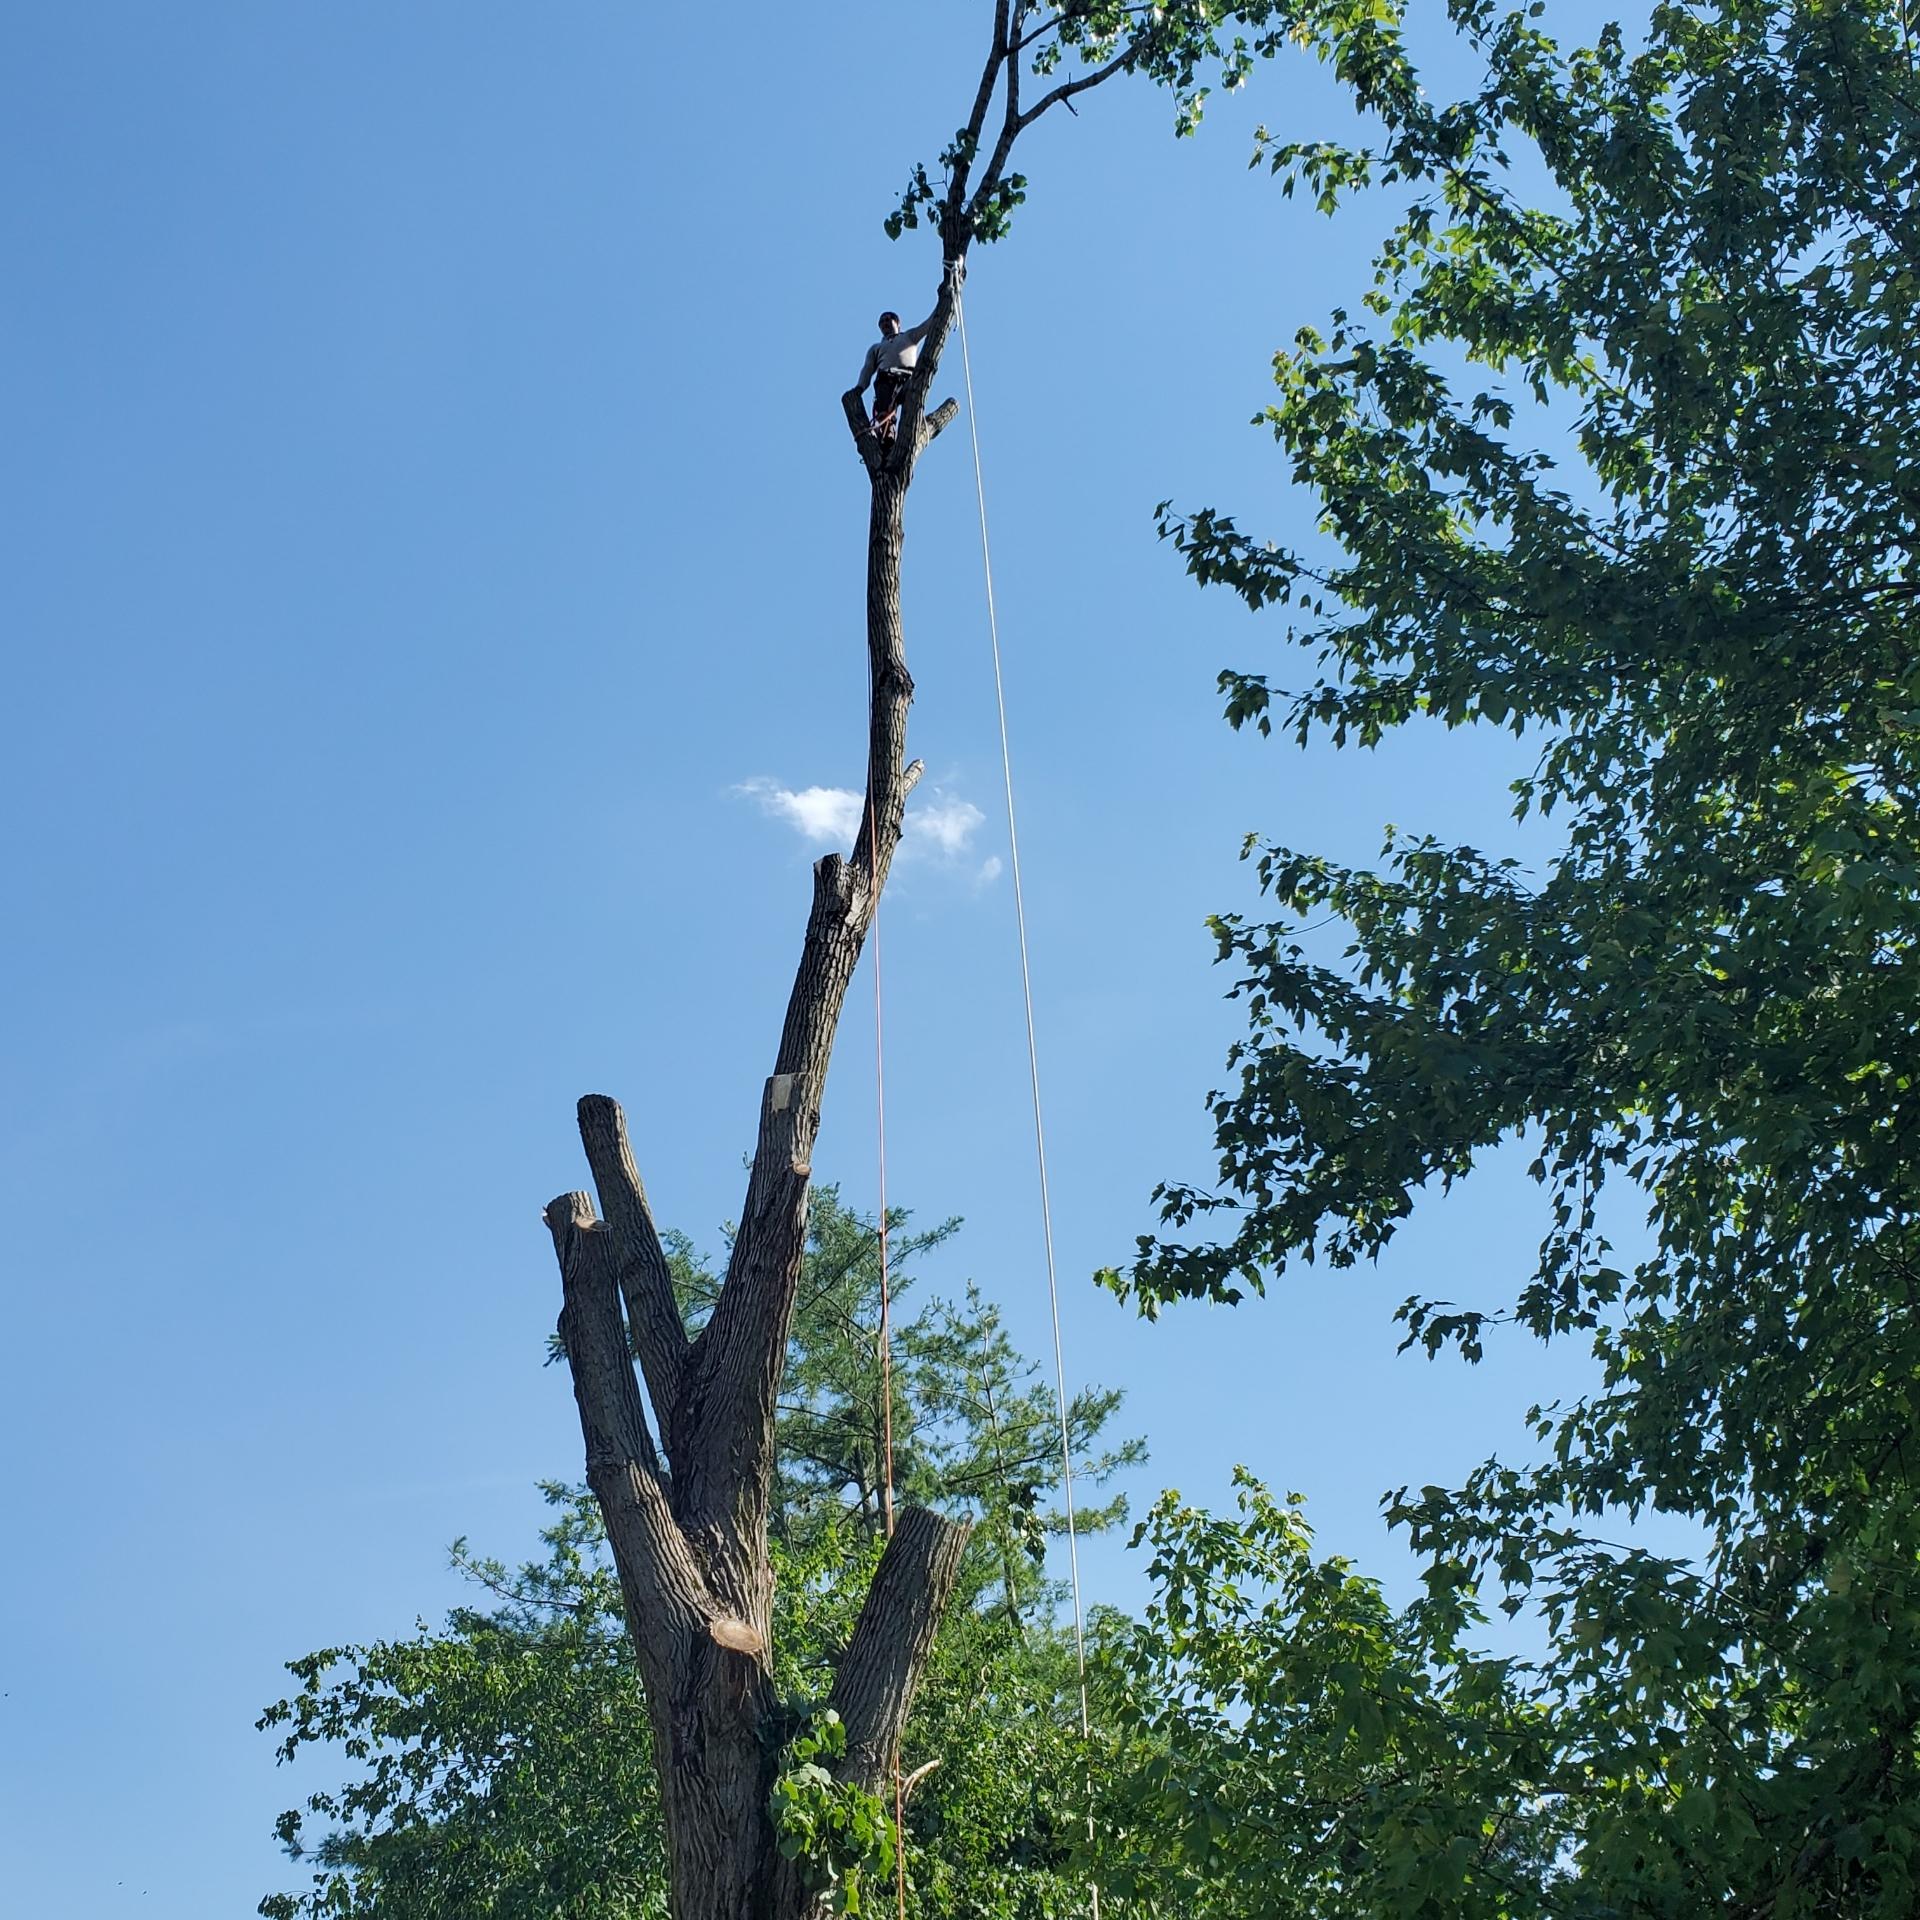 TRD tree service